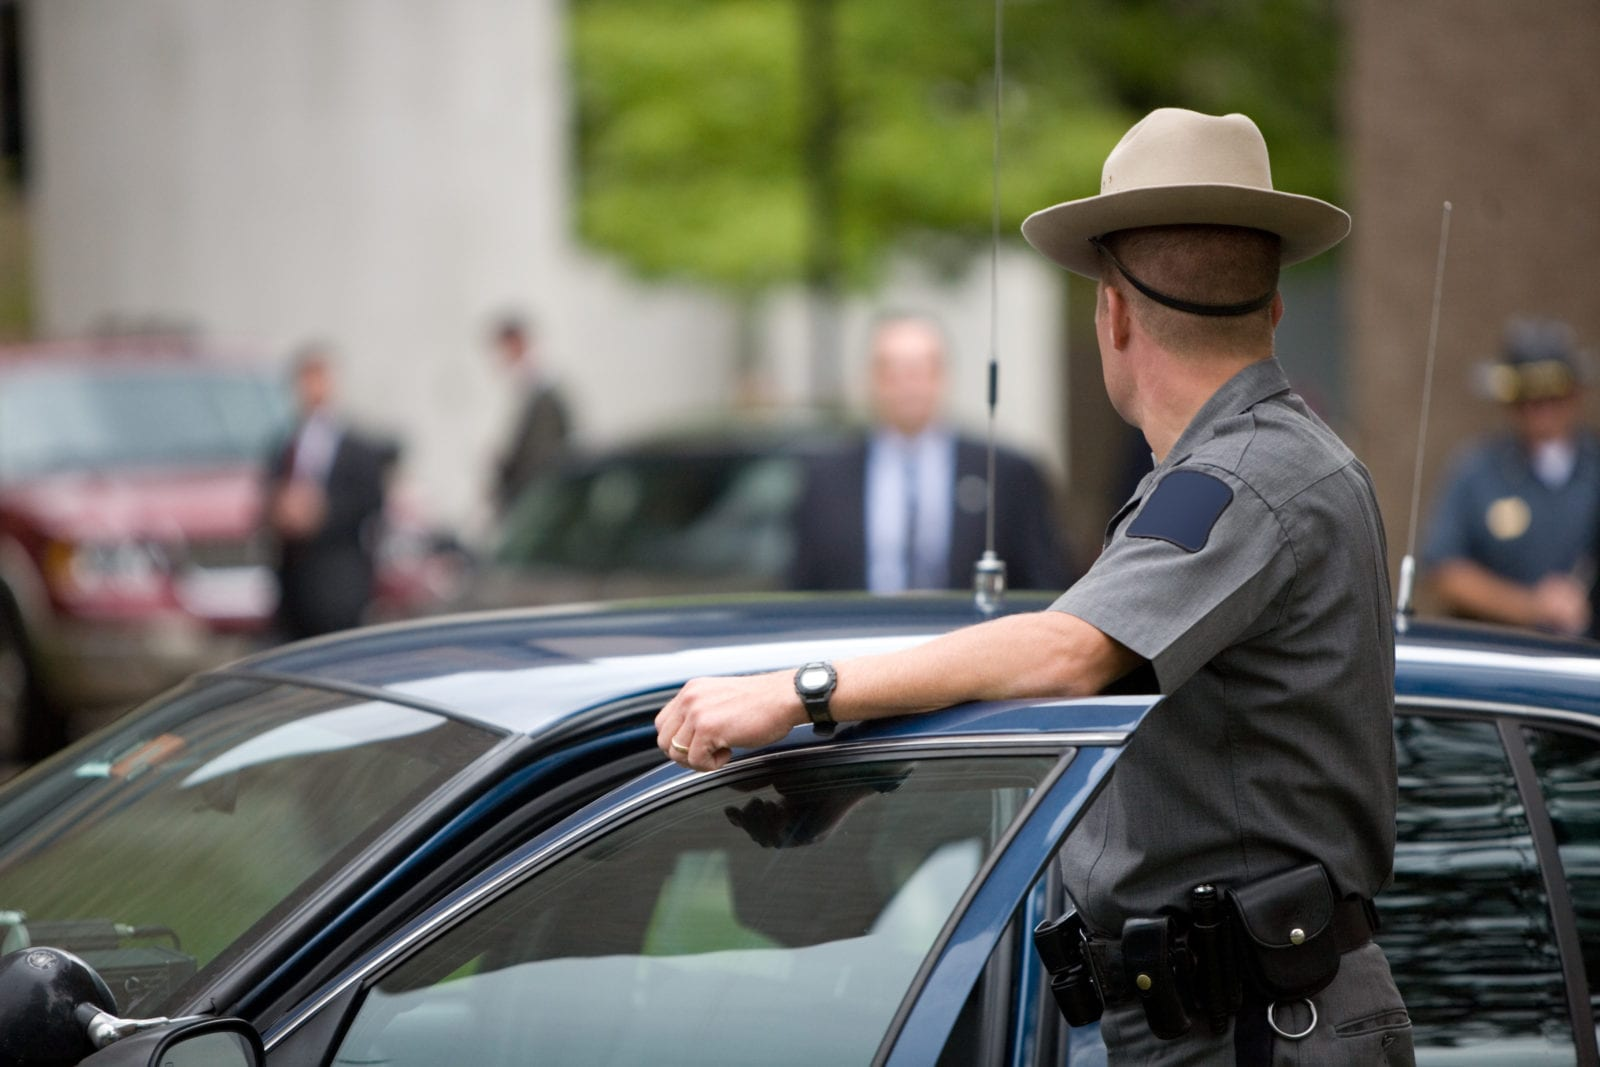 state trooper surveys area